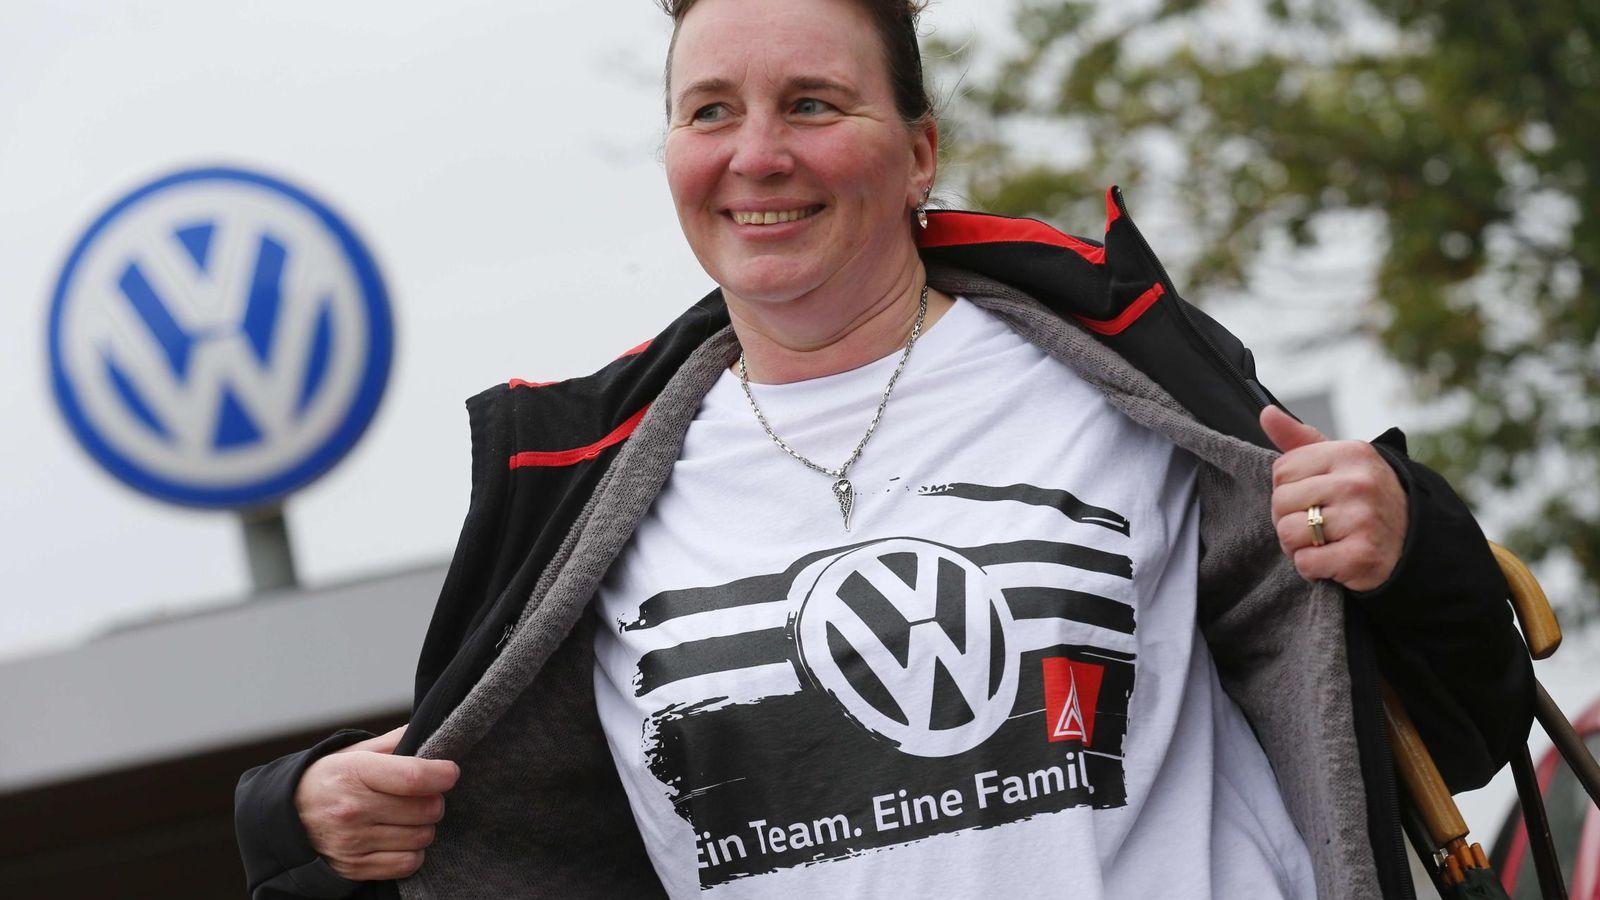 Foto: Una empleada de Volkswen luce el emblema de la compañía. (Reuters)